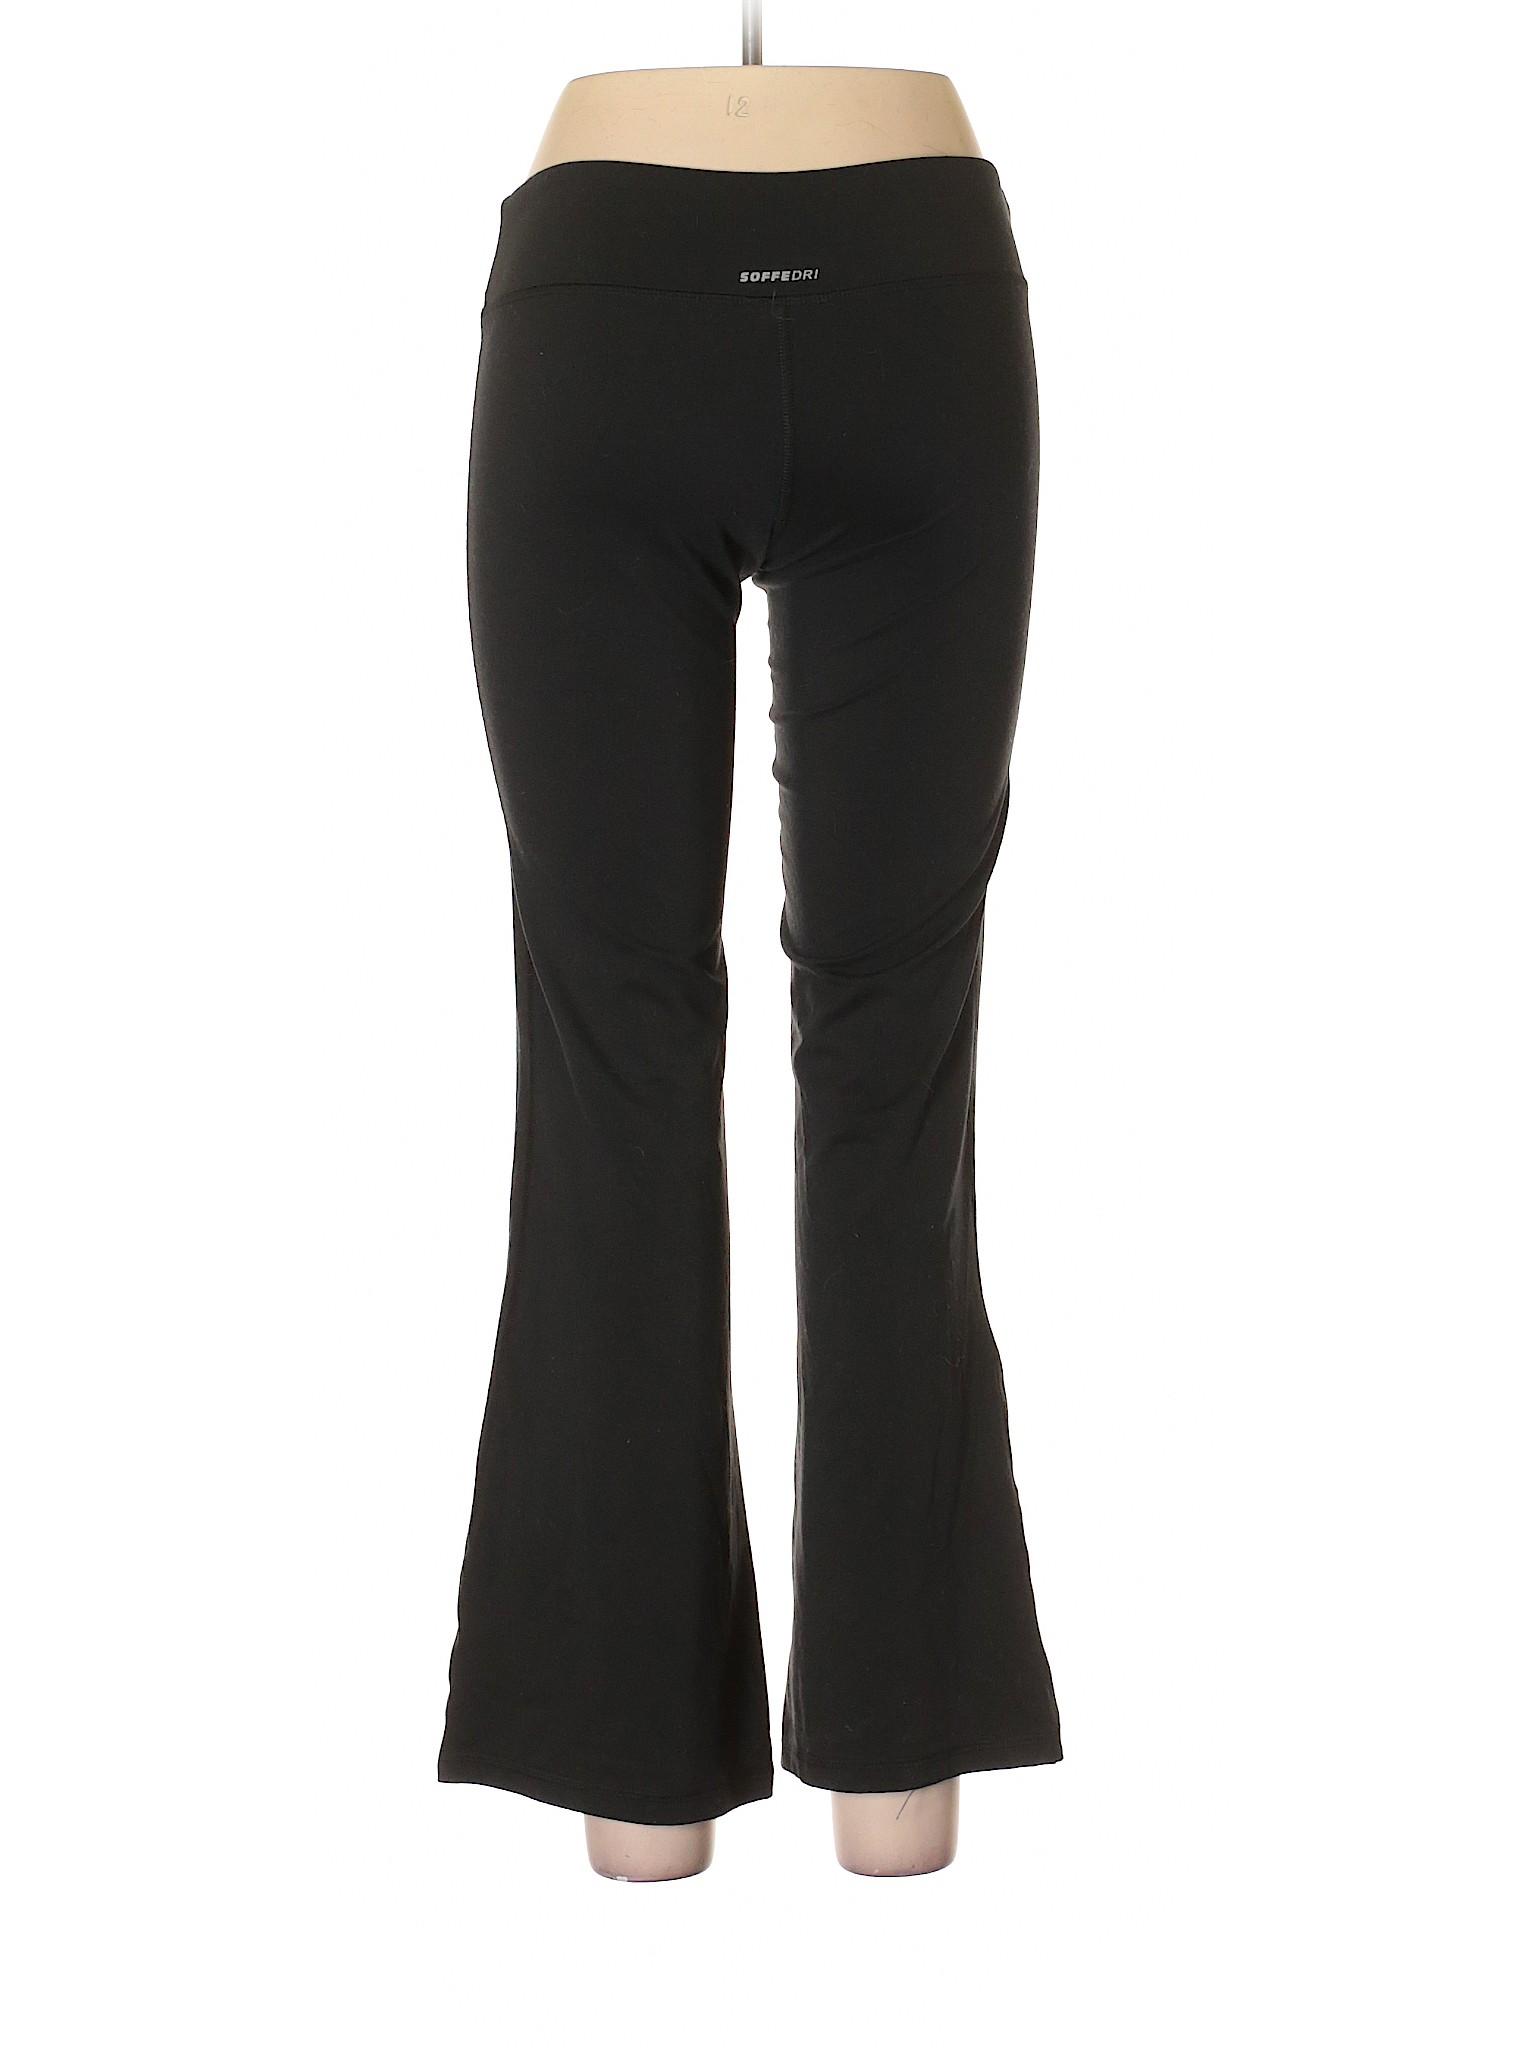 Boutique Boutique Soffe Soffe Active Active Pants Leisure Pants Leisure Boutique BpCSqx